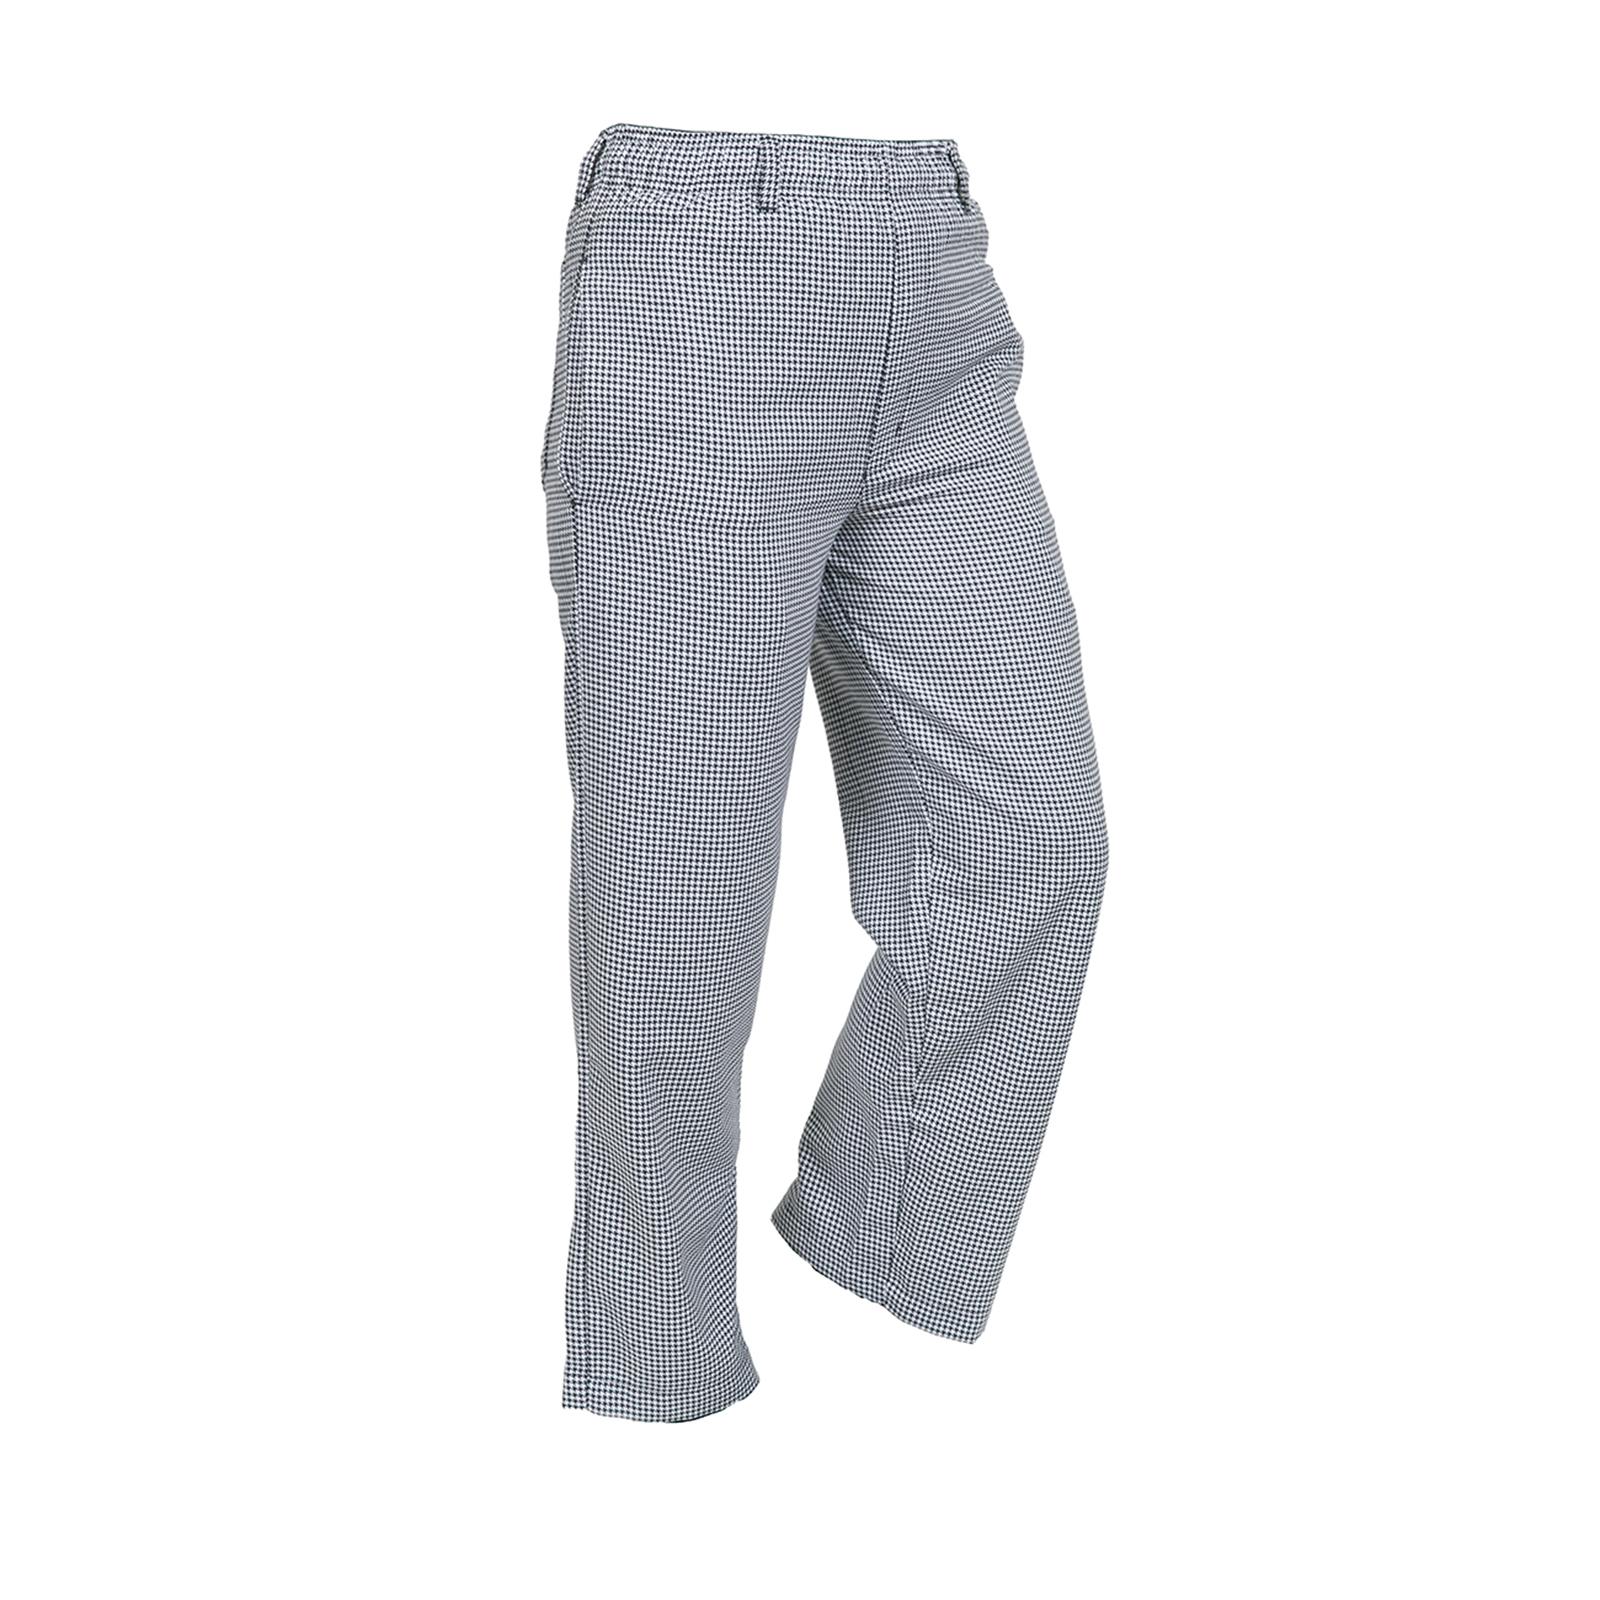 Mercer Culinary M60030HT7X chef's pants